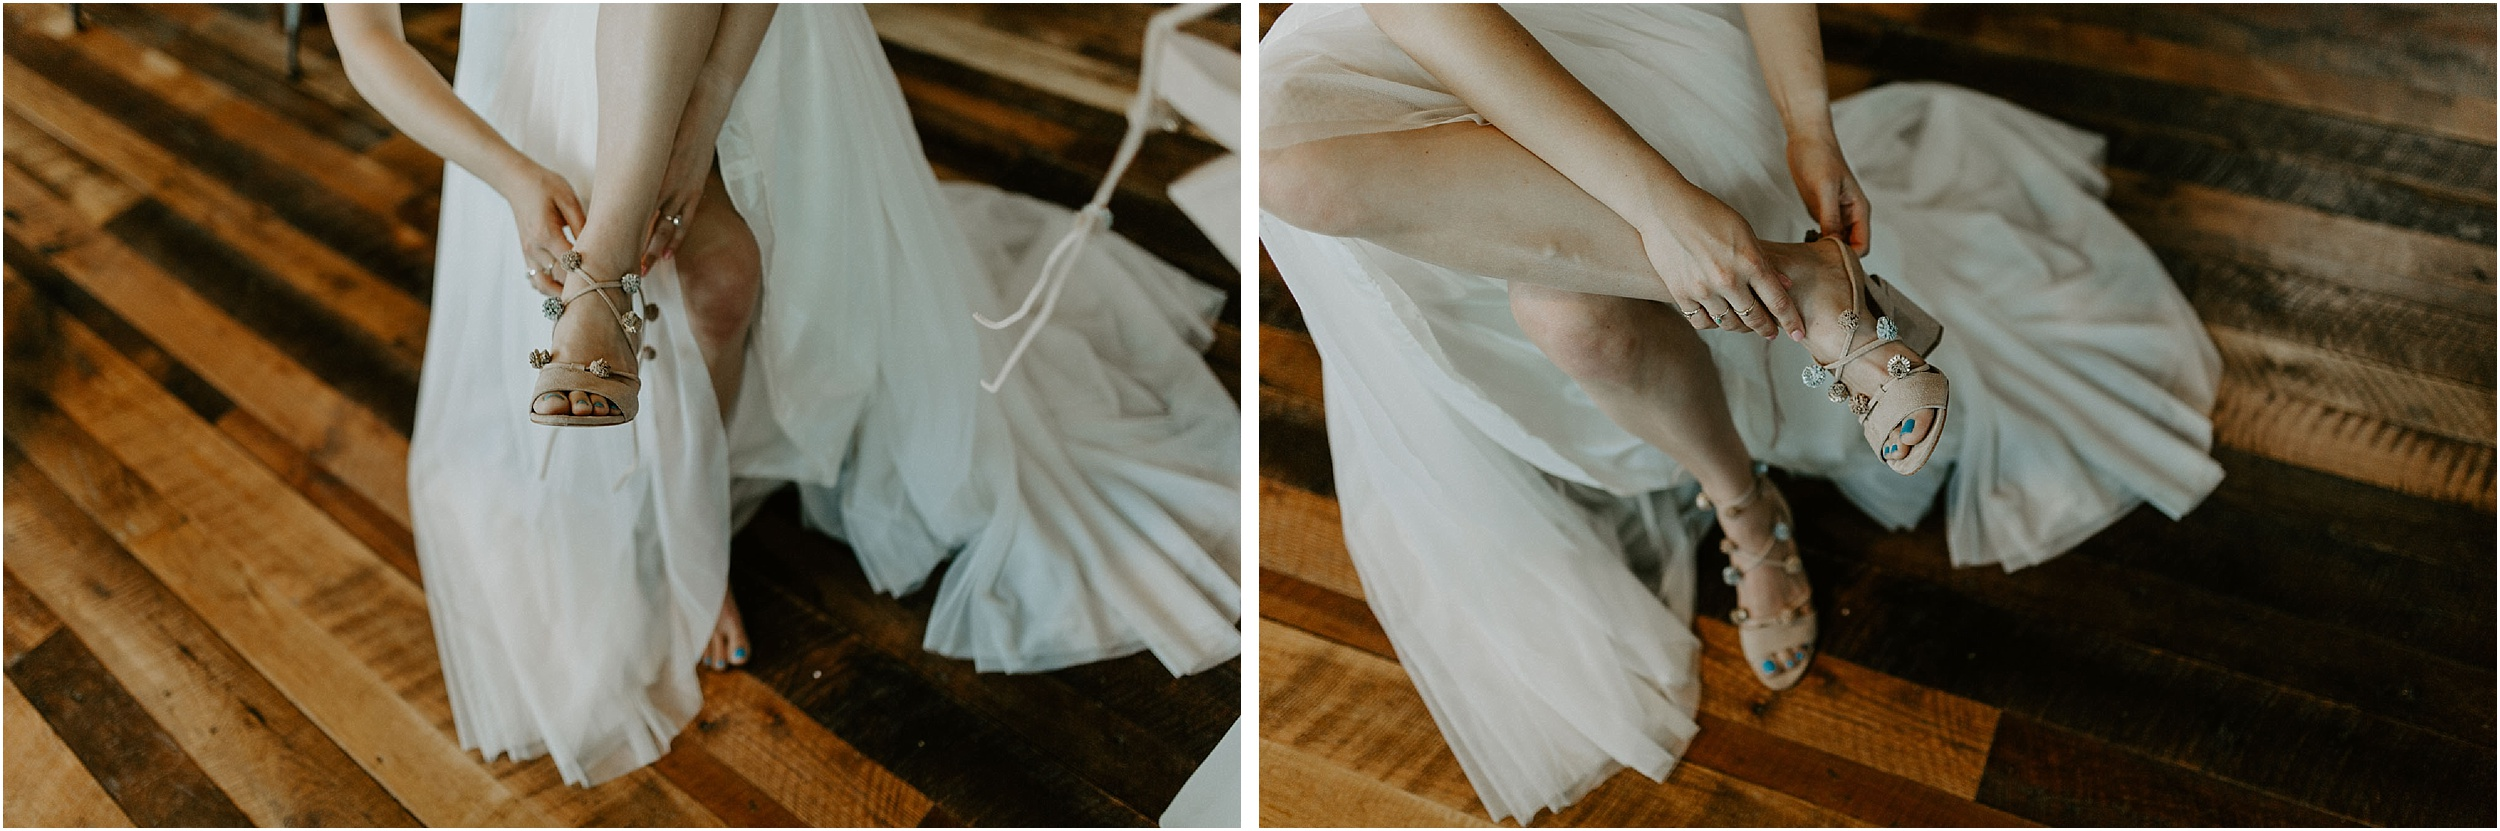 journeyman_distillery_wedding_photographer_chicago_il_wright_photographs-1119.jpg